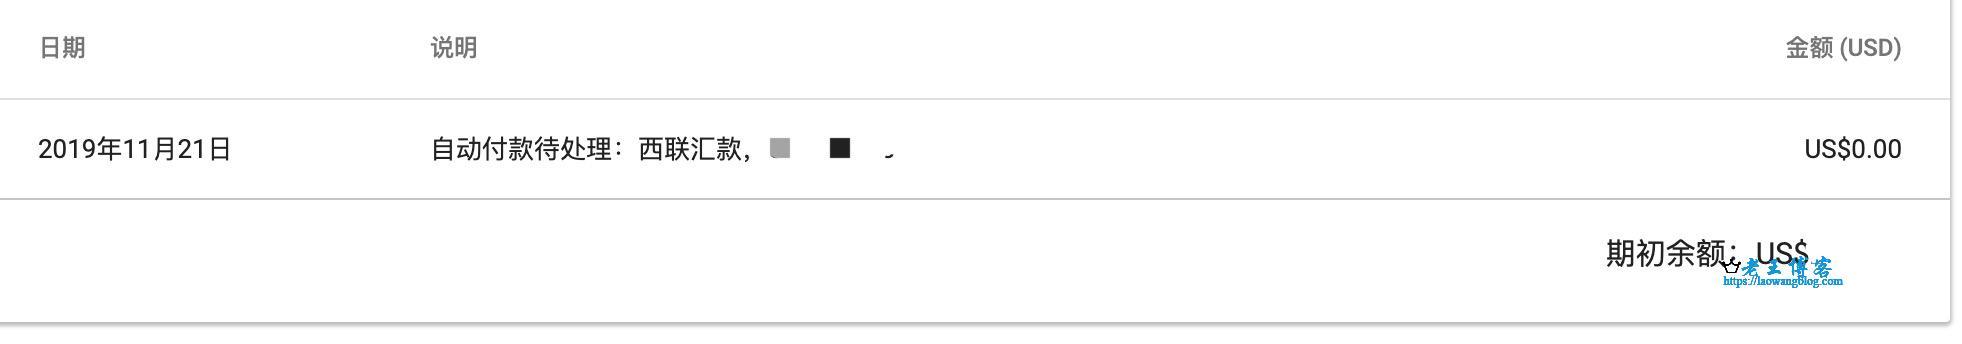 Google Adsense 付款不到账